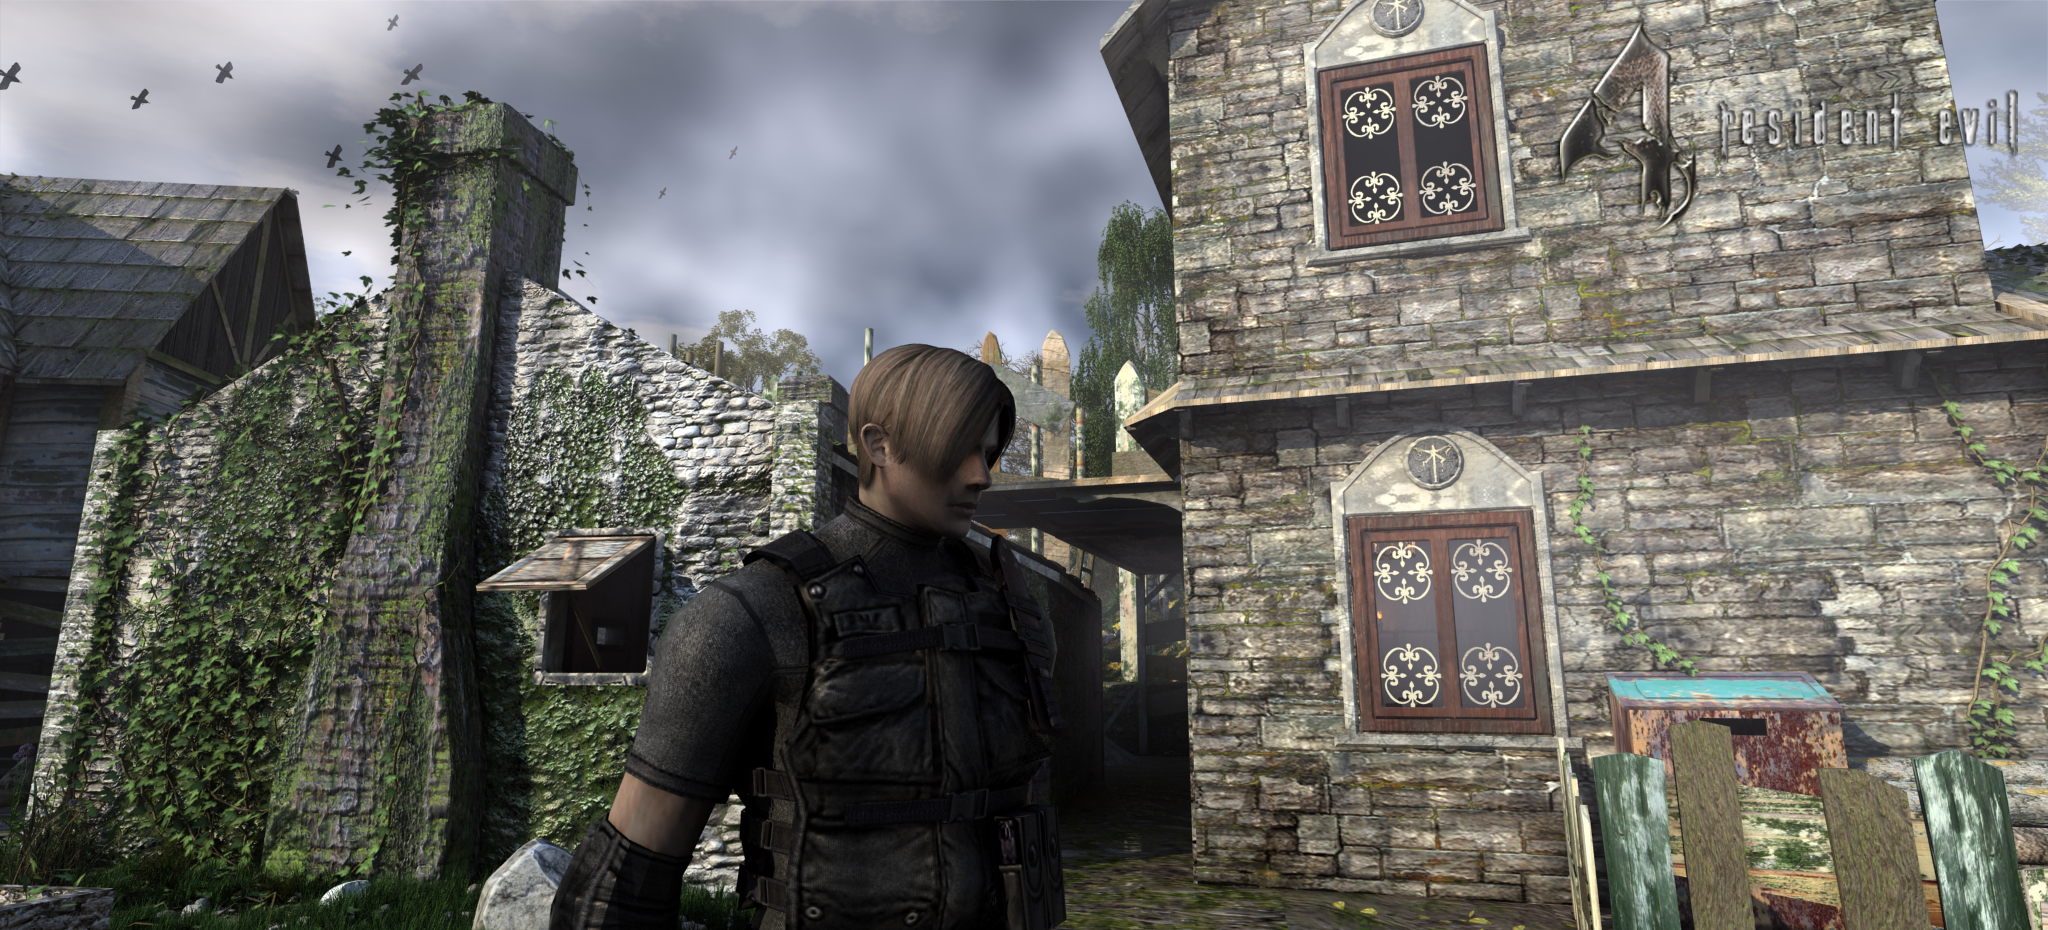 Resident Evil4 remake leon by Bowu on DeviantArt